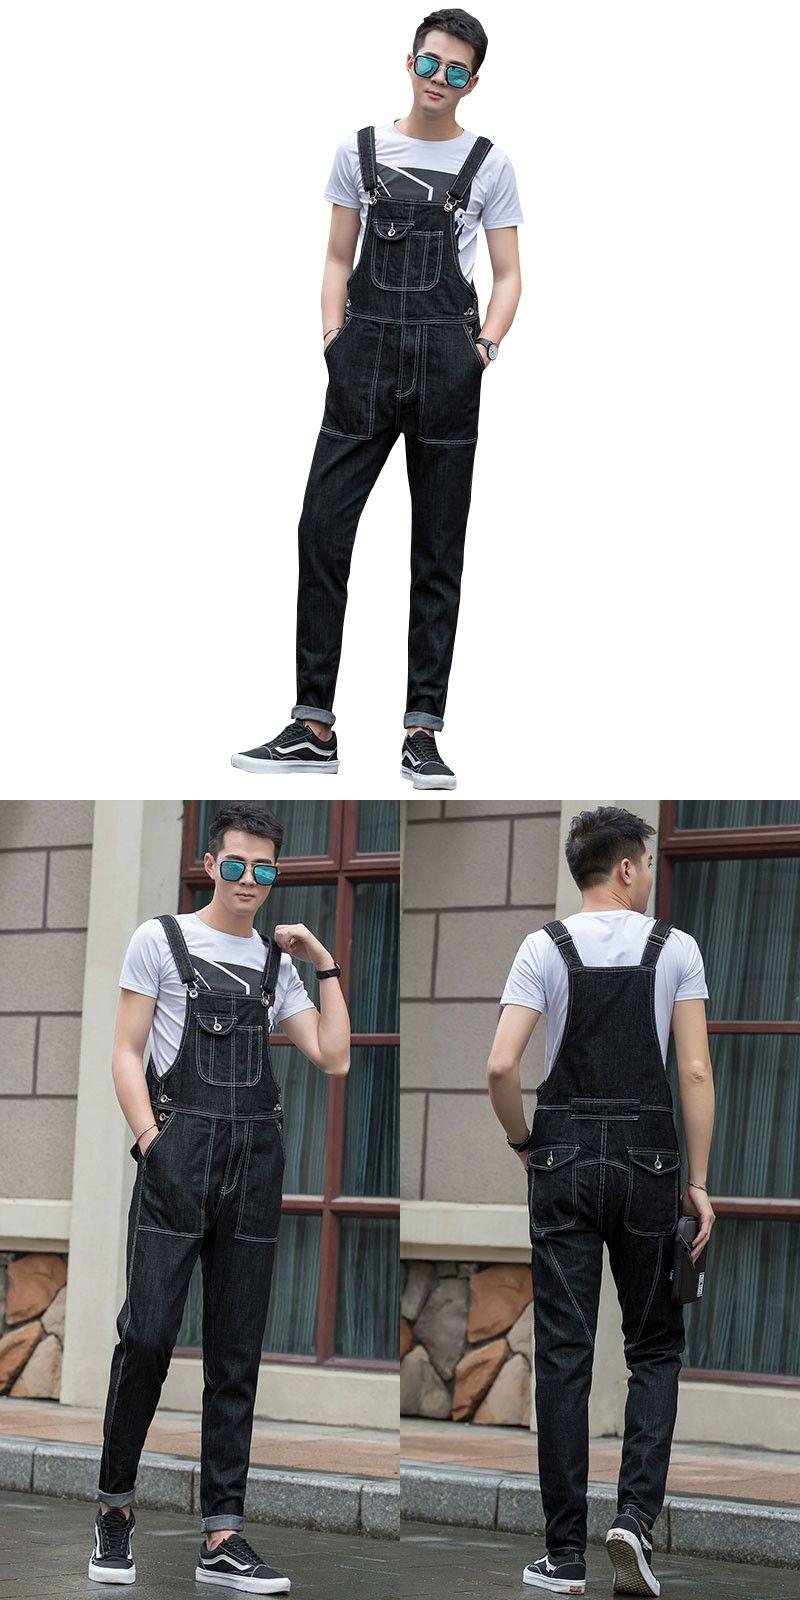 0d2dcb43788 2017 New Bib Denim Overalls For Men Brand Long Solid Black Slim Cowboy  Overall Cotton Skinny Overalls Men s Jeans Size S-5XL